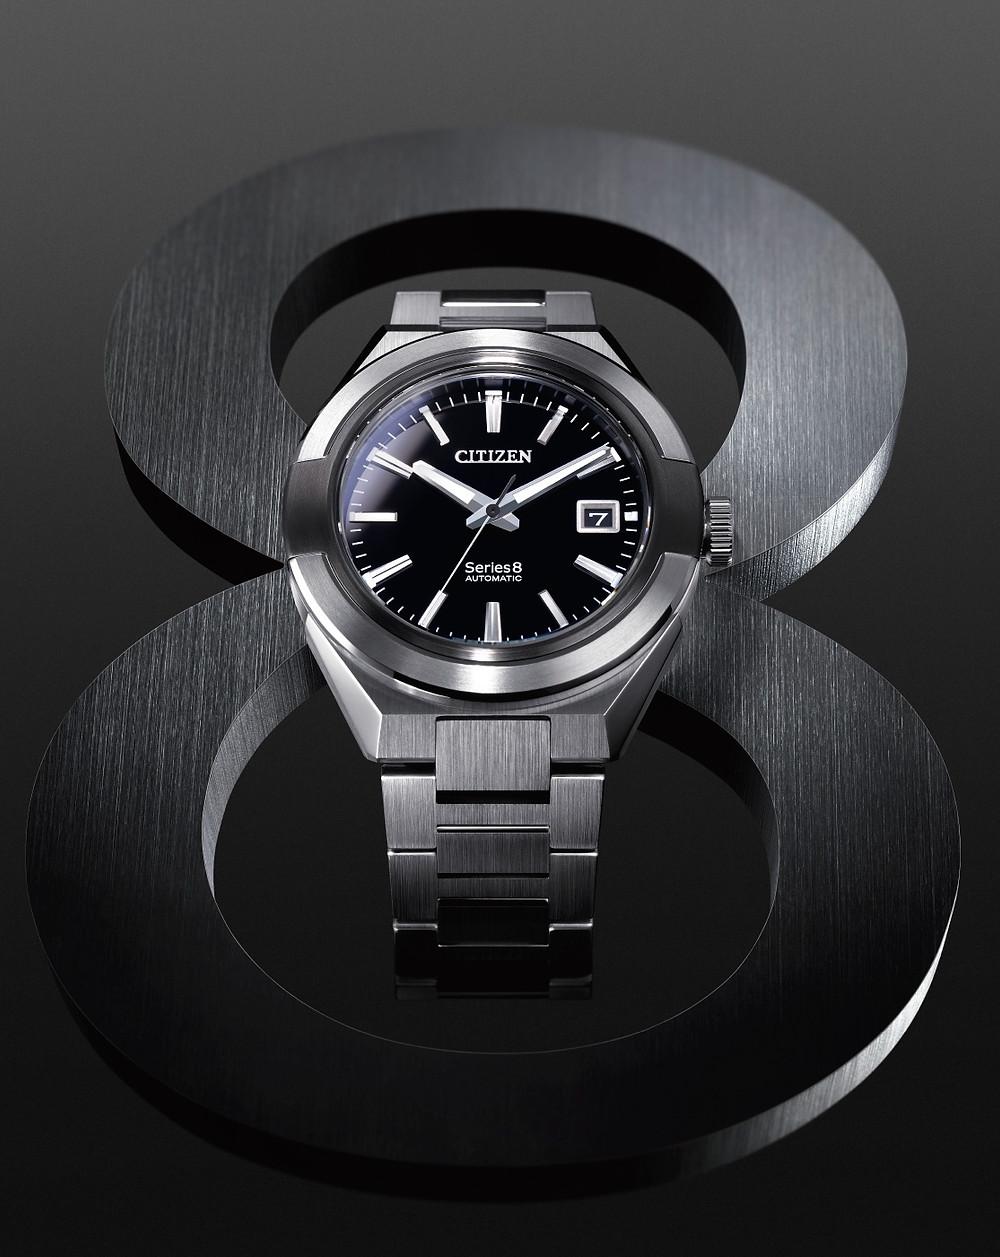 Novedad mundial relojes Citizen serie-8 calibre automatico0950